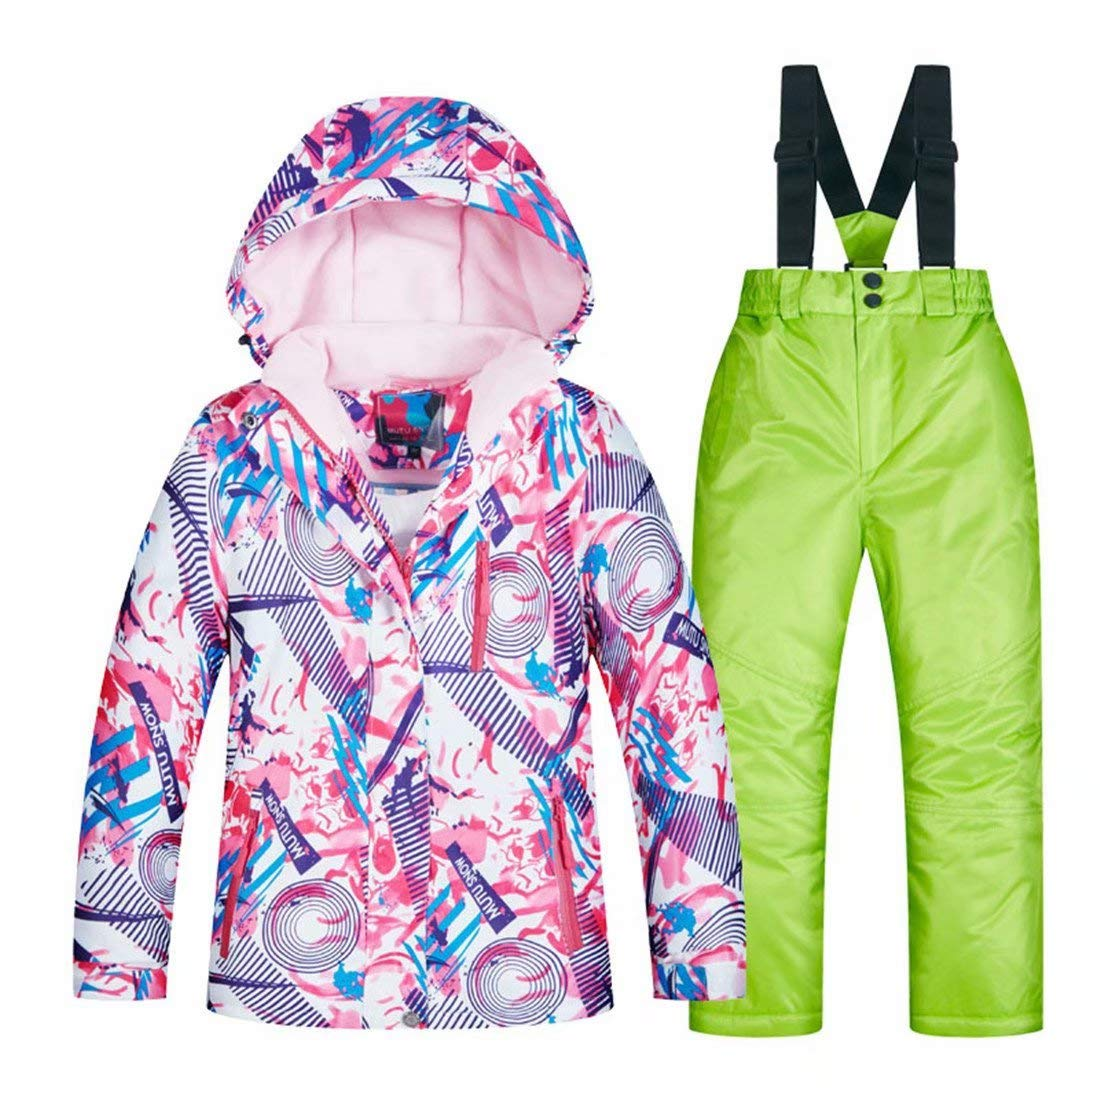 OLEK Girls Waterproof Ski Snowboarding Jackets and Pants Set Insulated Snowboard Snowsuit